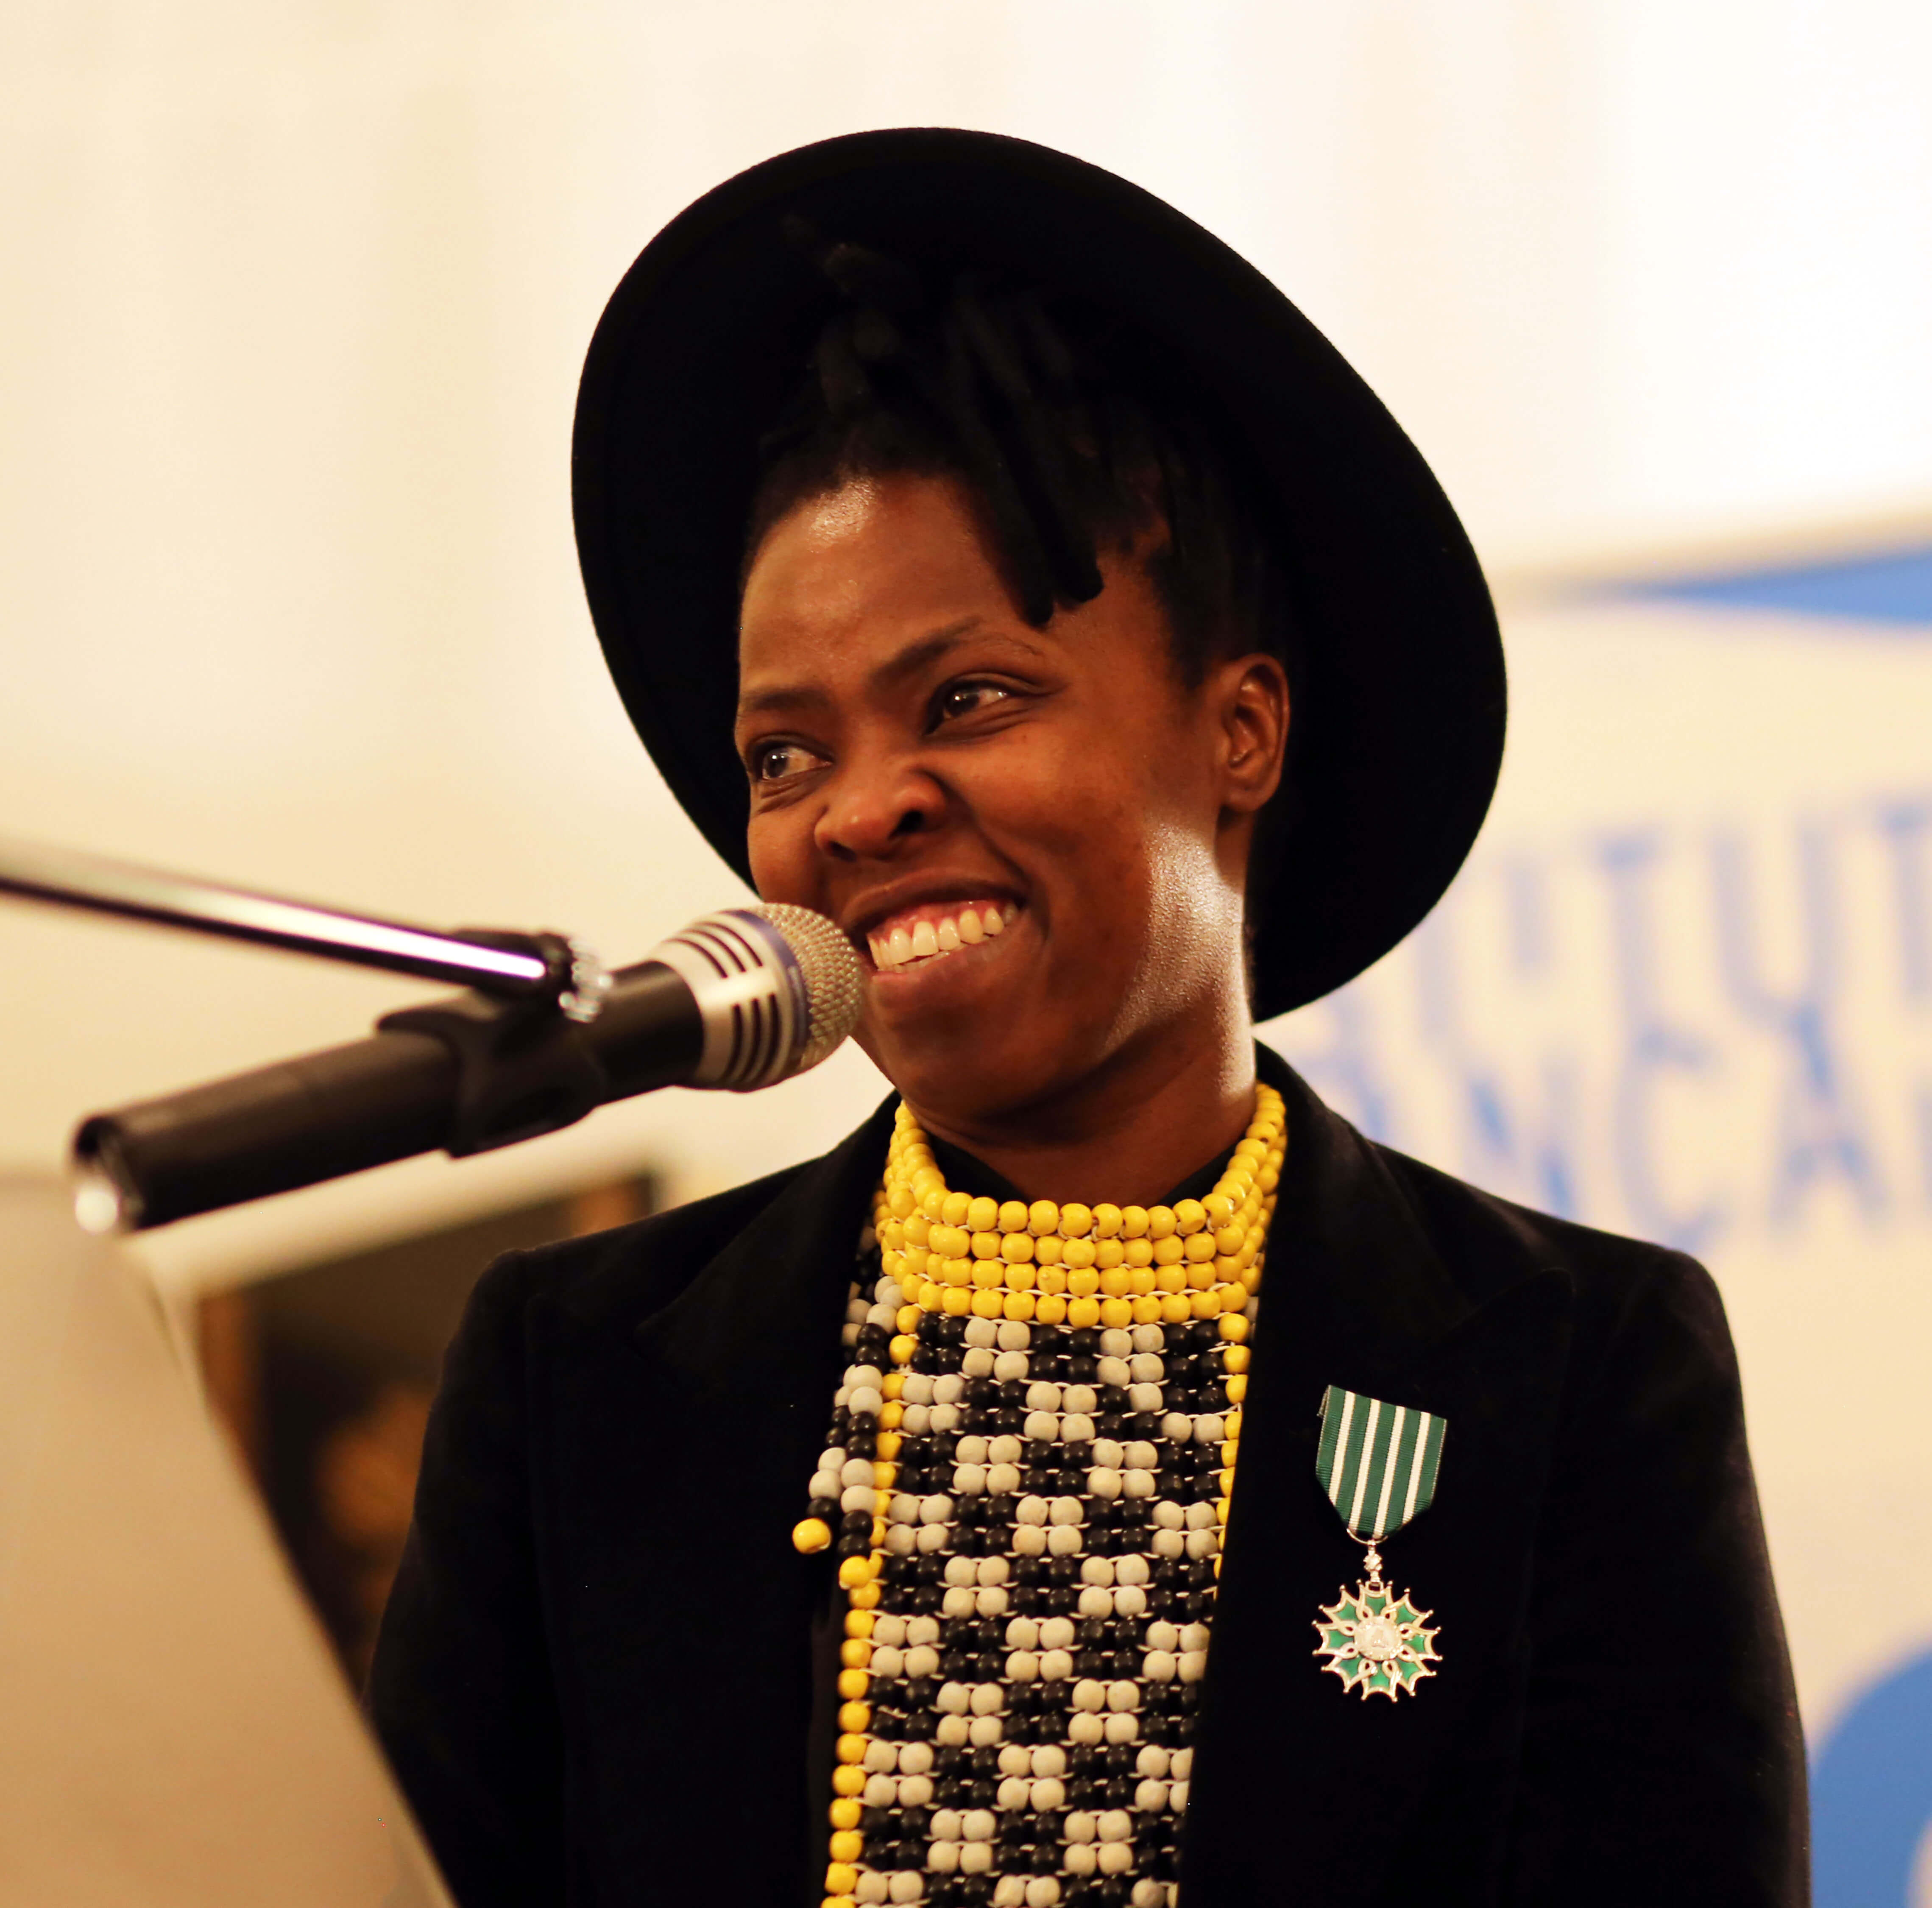 Zanele Muholi giving thanks and sharing her acceptance speech. Photography: Lerato Dumse. Courtesy of the photographer.